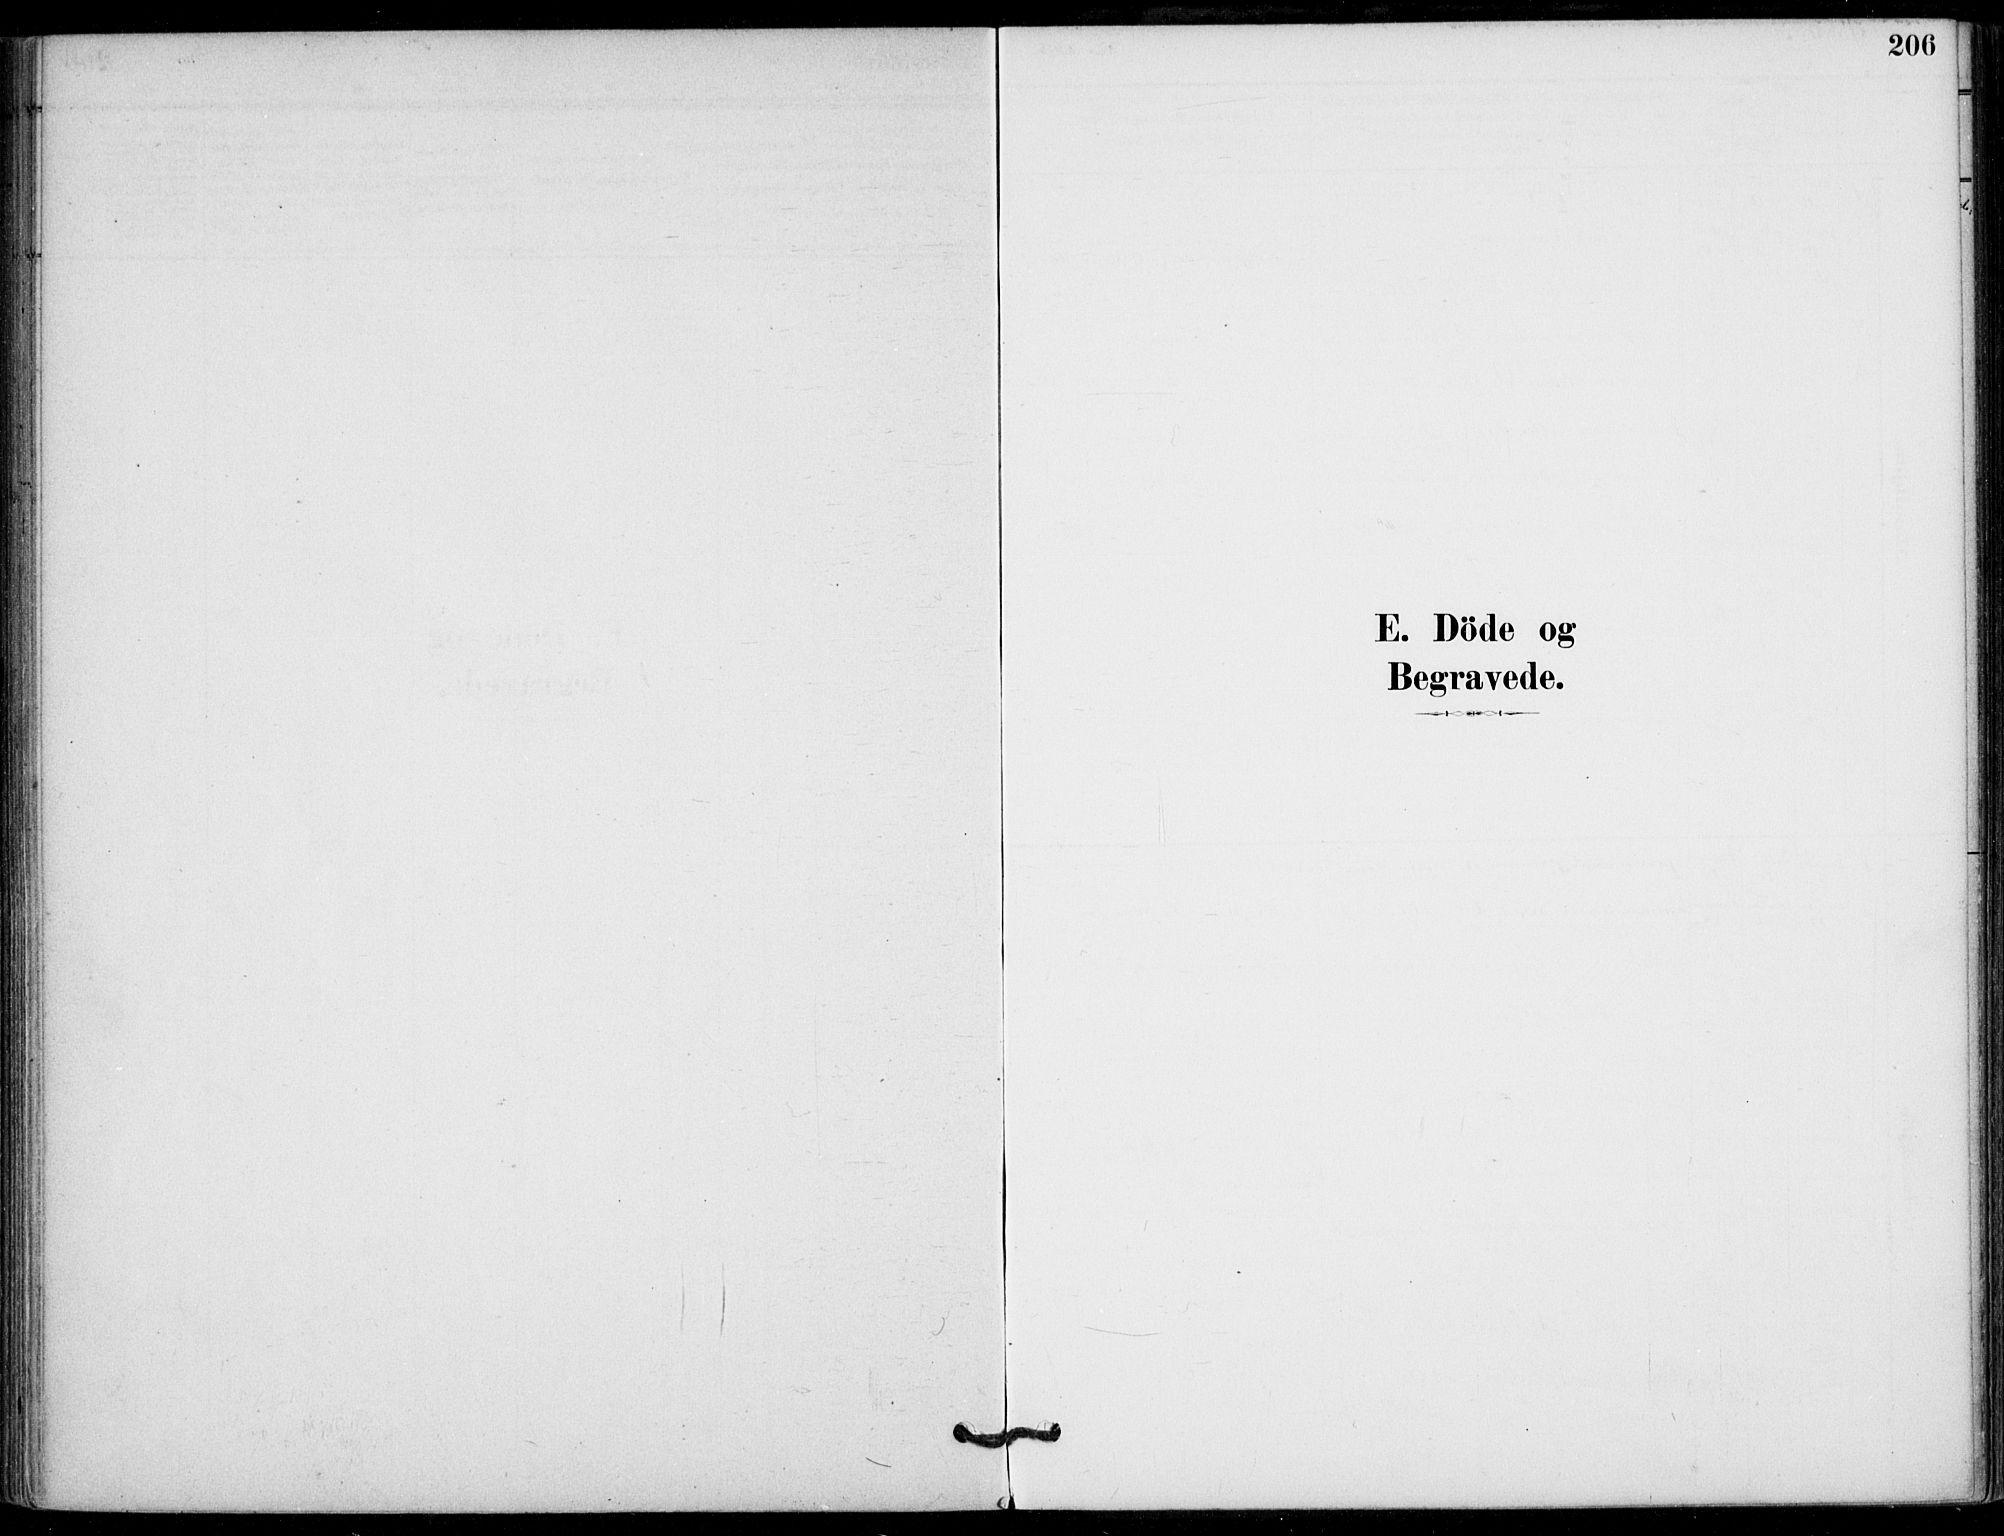 SAKO, Hjartdal kirkebøker, F/Fb/L0002: Ministerialbok nr. II 2, 1880-1932, s. 206